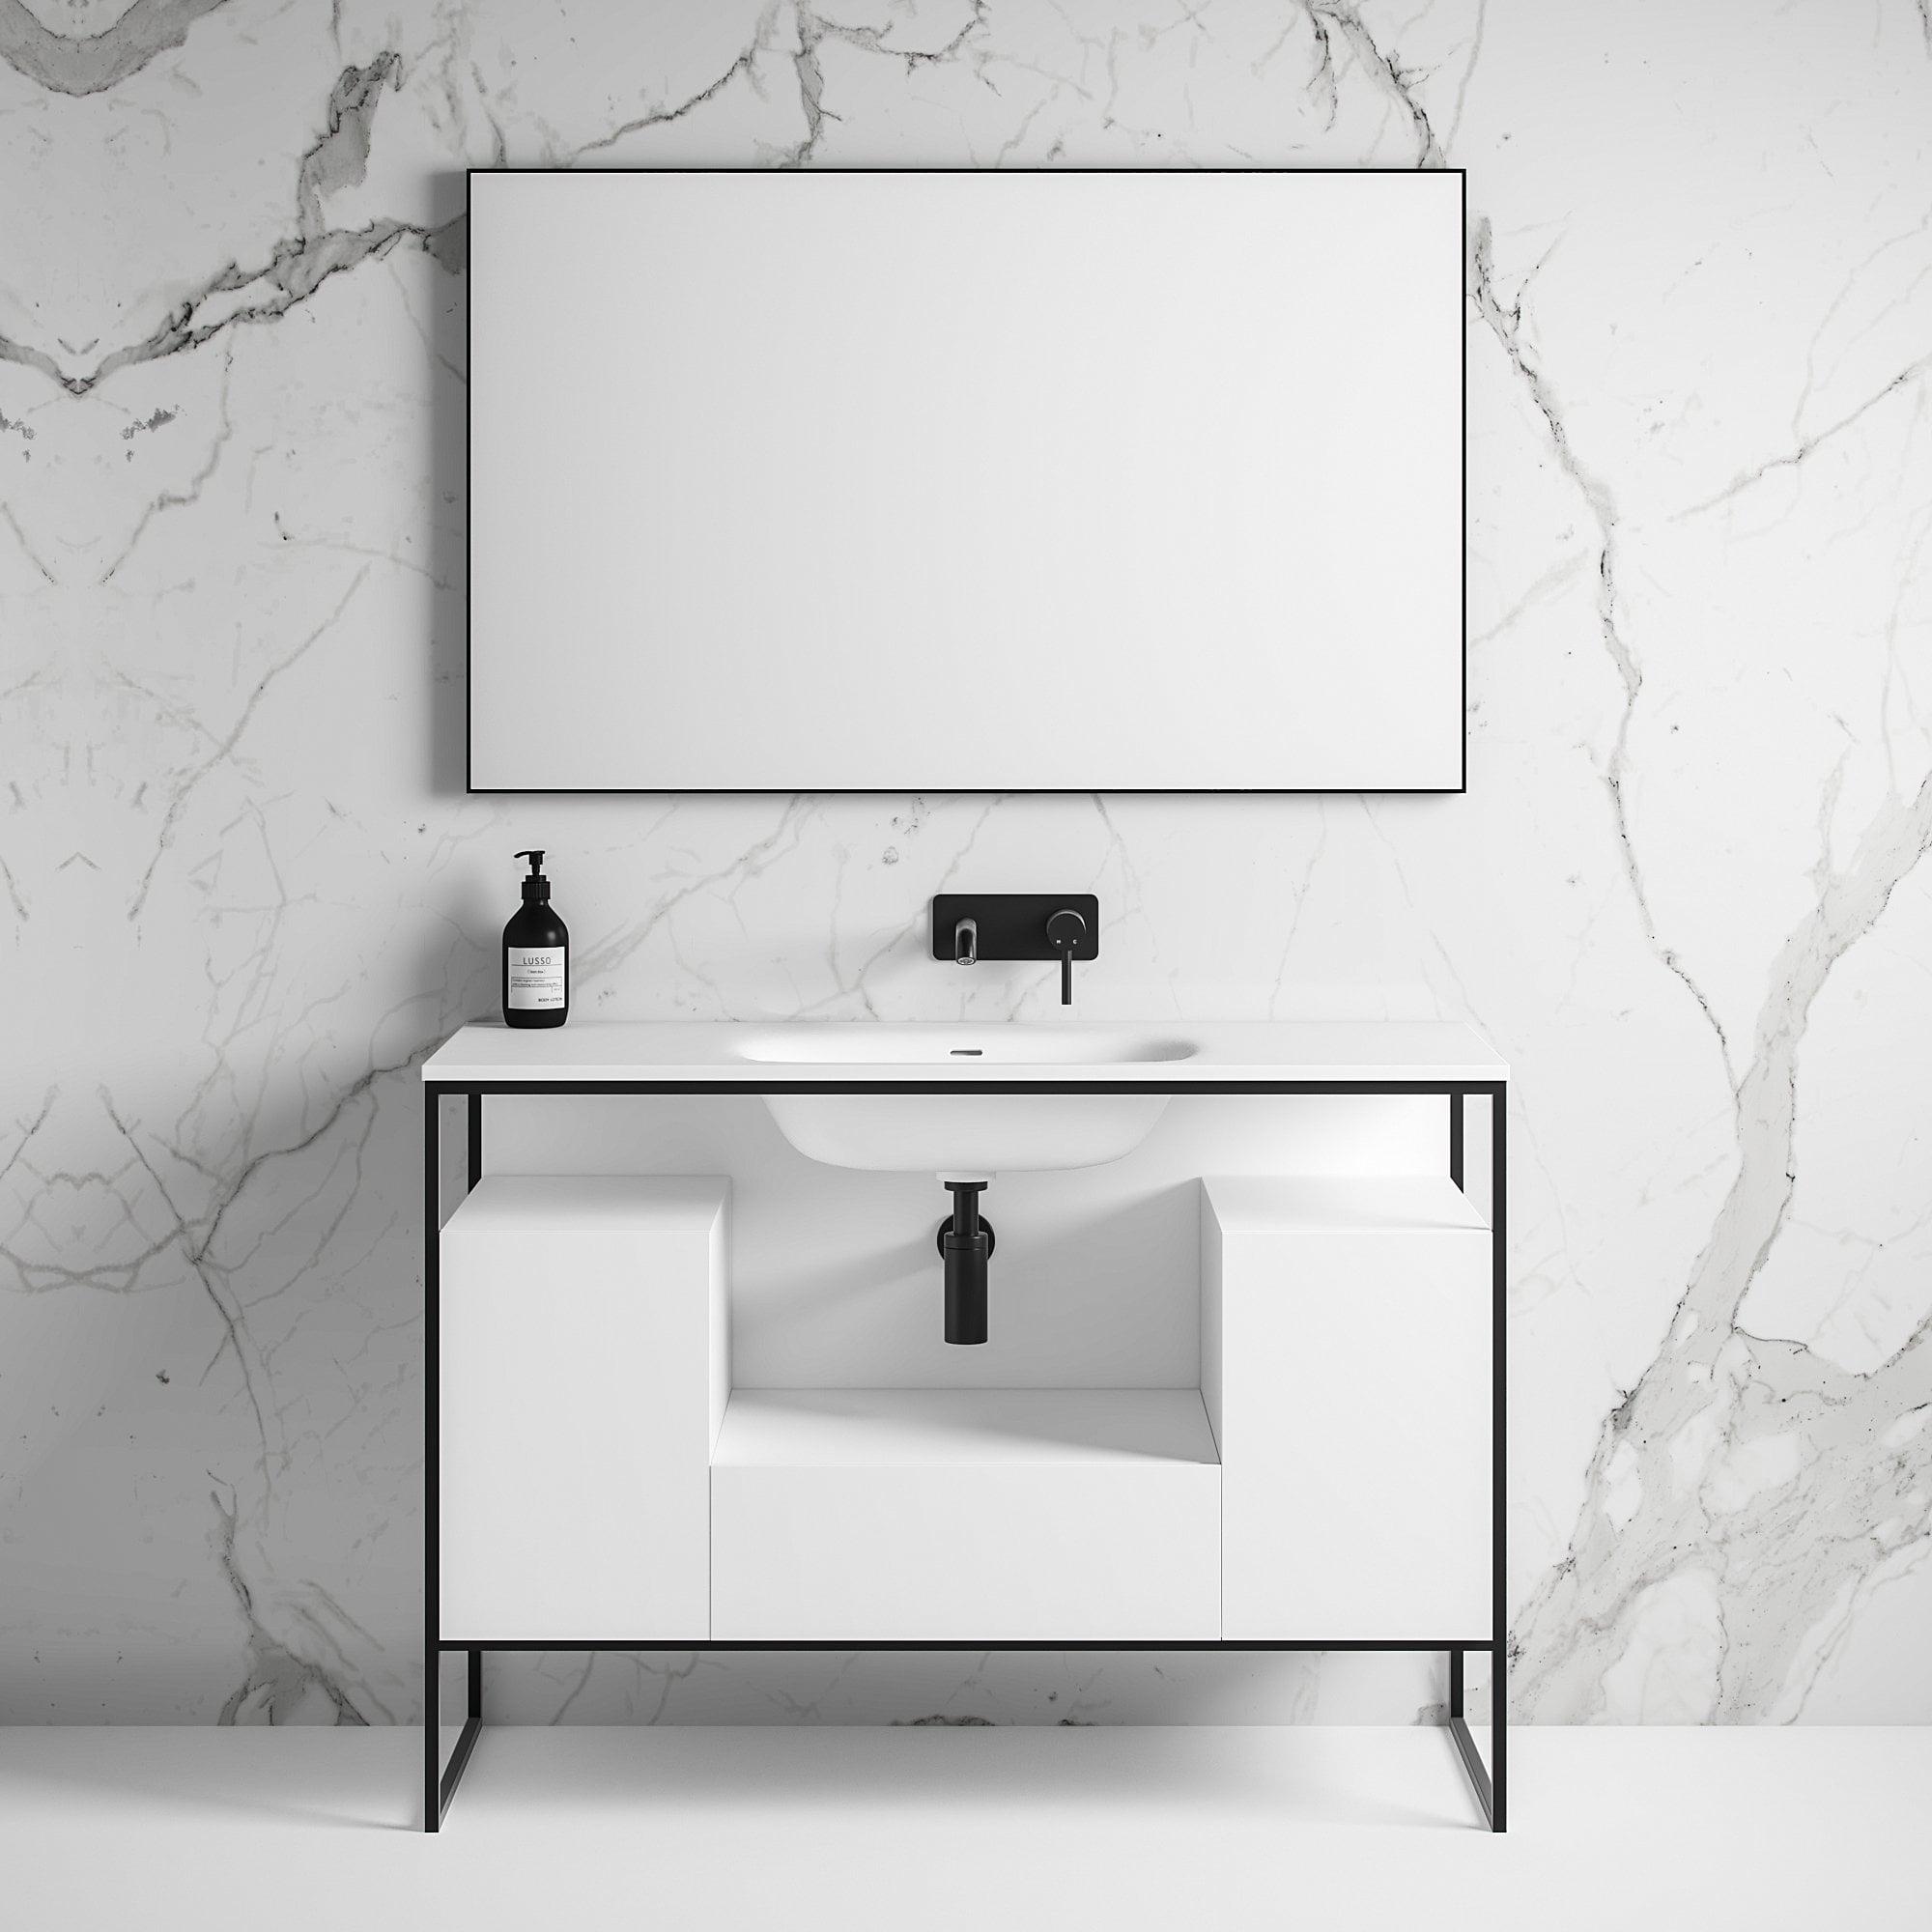 Luxe 1200 Matte Black Framed Freestanding Bathroom Vanity Unit